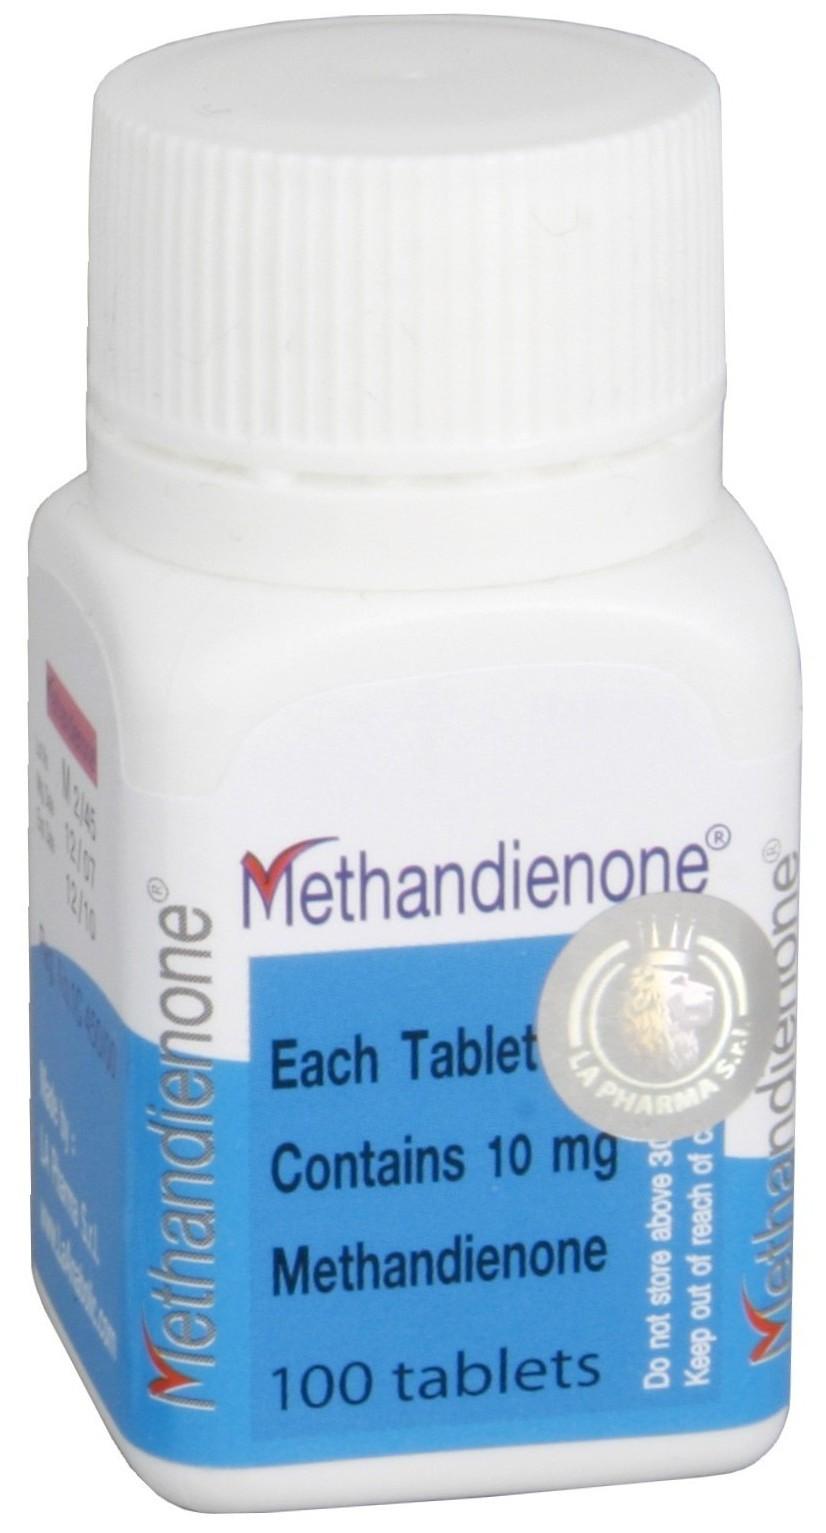 Menabol 2 mg baclofen